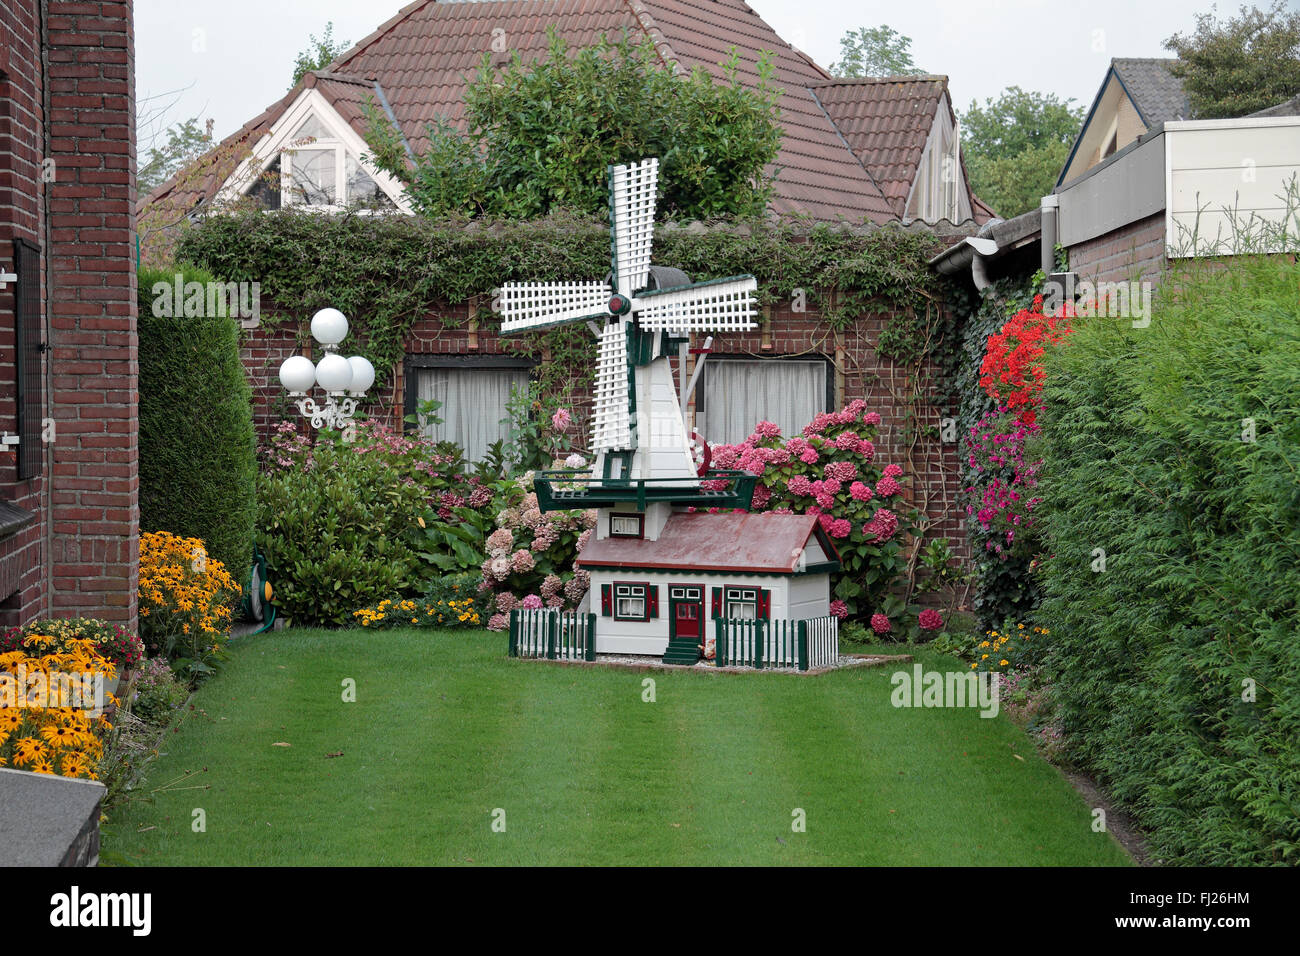 Ornate Garden Ornament In The Shape Of A Windmill In A Garden In Uden,  Noord Brabant, Netherlands.